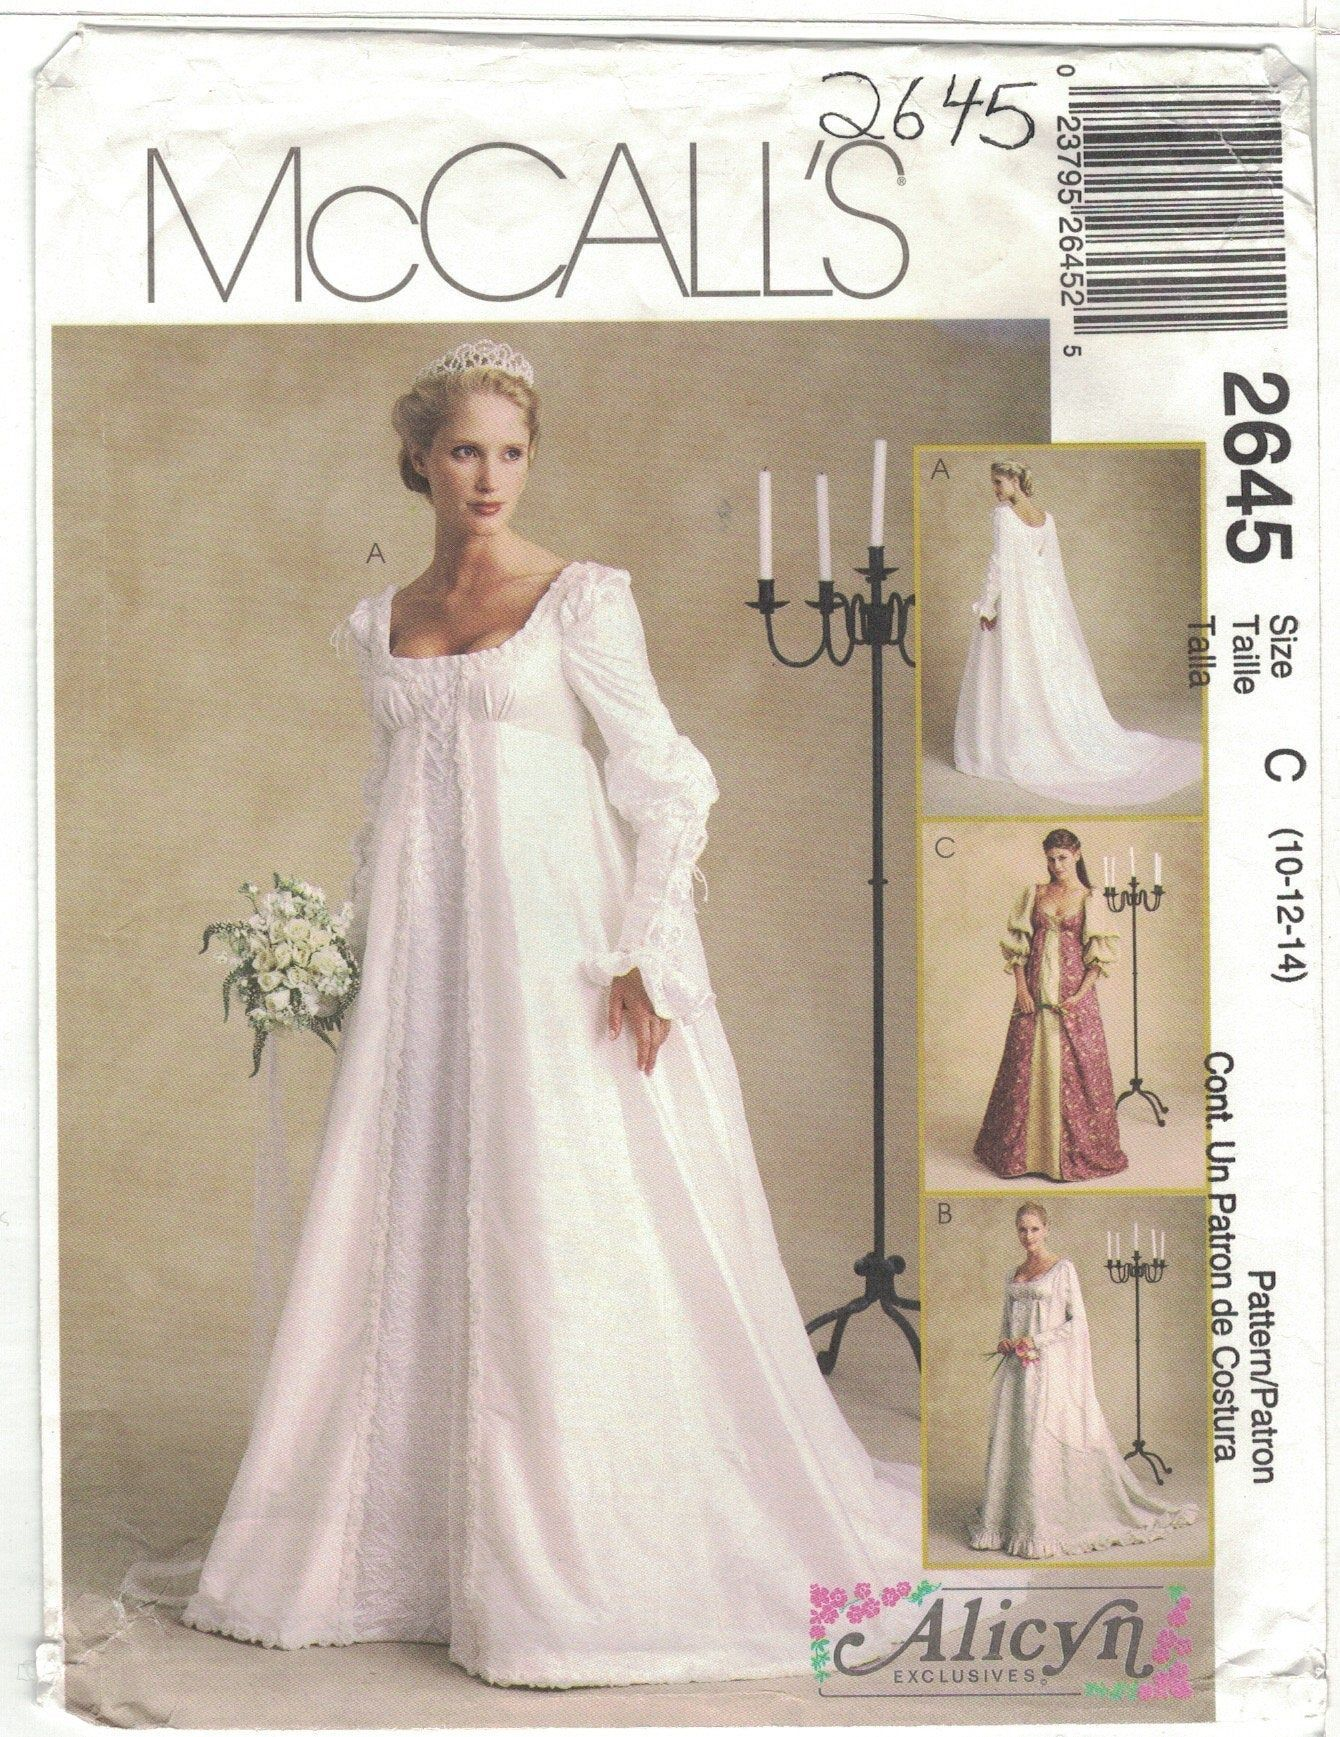 Mccall S 2645 Alicyn Renaissance Regency Cosplay Wedding Etsy Gown Pattern Empire Waist Wedding Dress Wedding Dress Patterns [ 1737 x 1340 Pixel ]